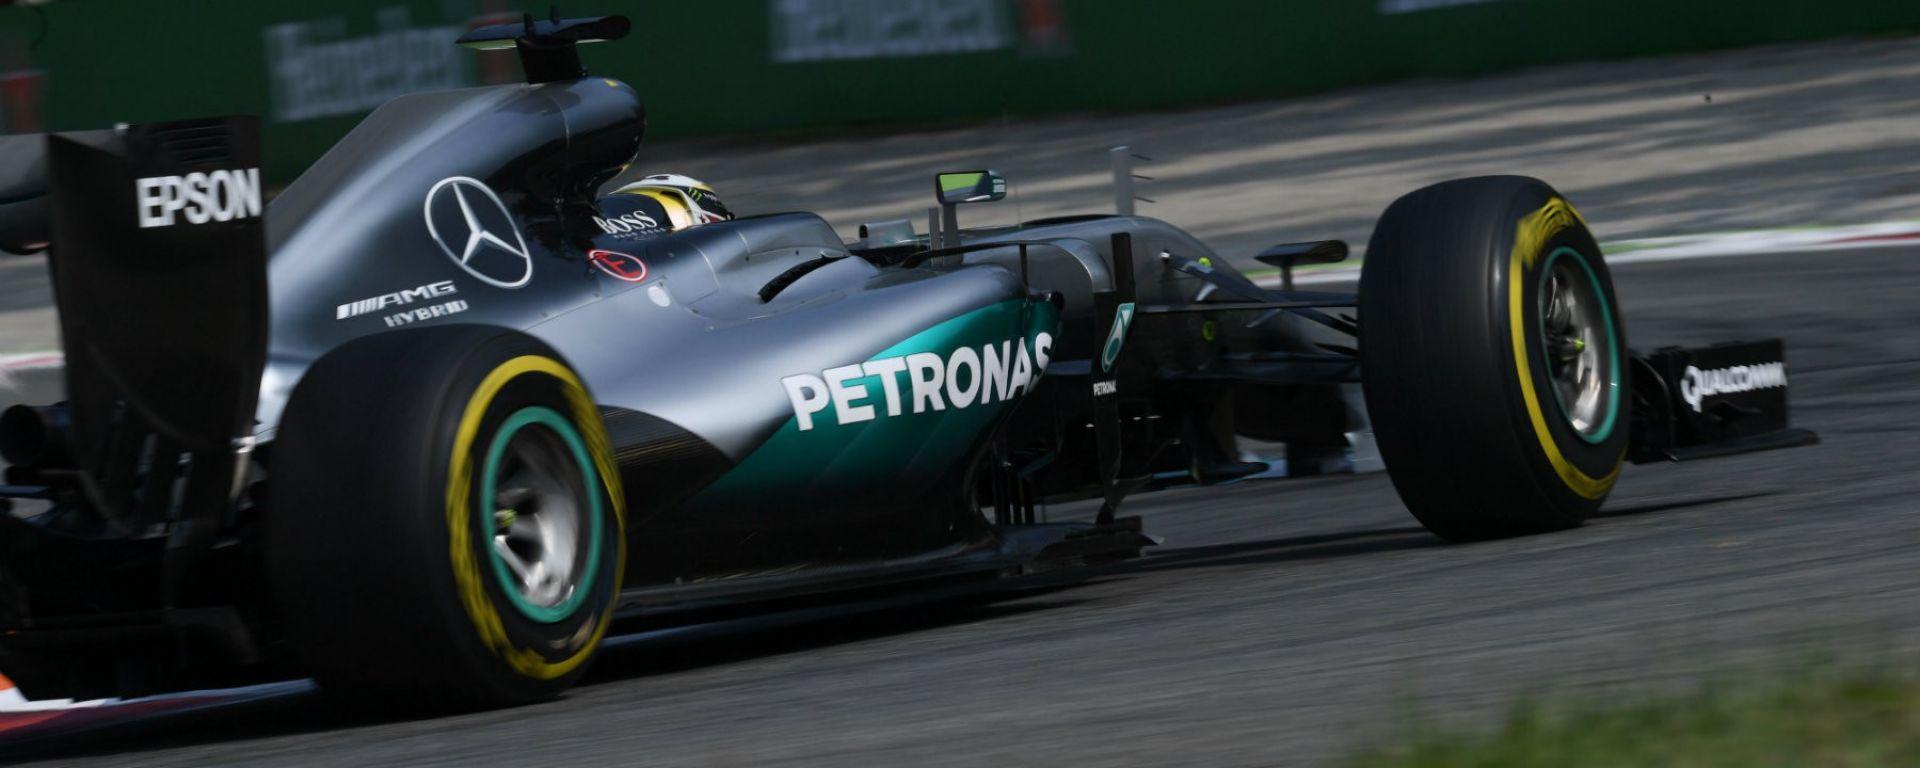 Mercedes Nanoslide: dalla Formula 1 al Zukunftspreis